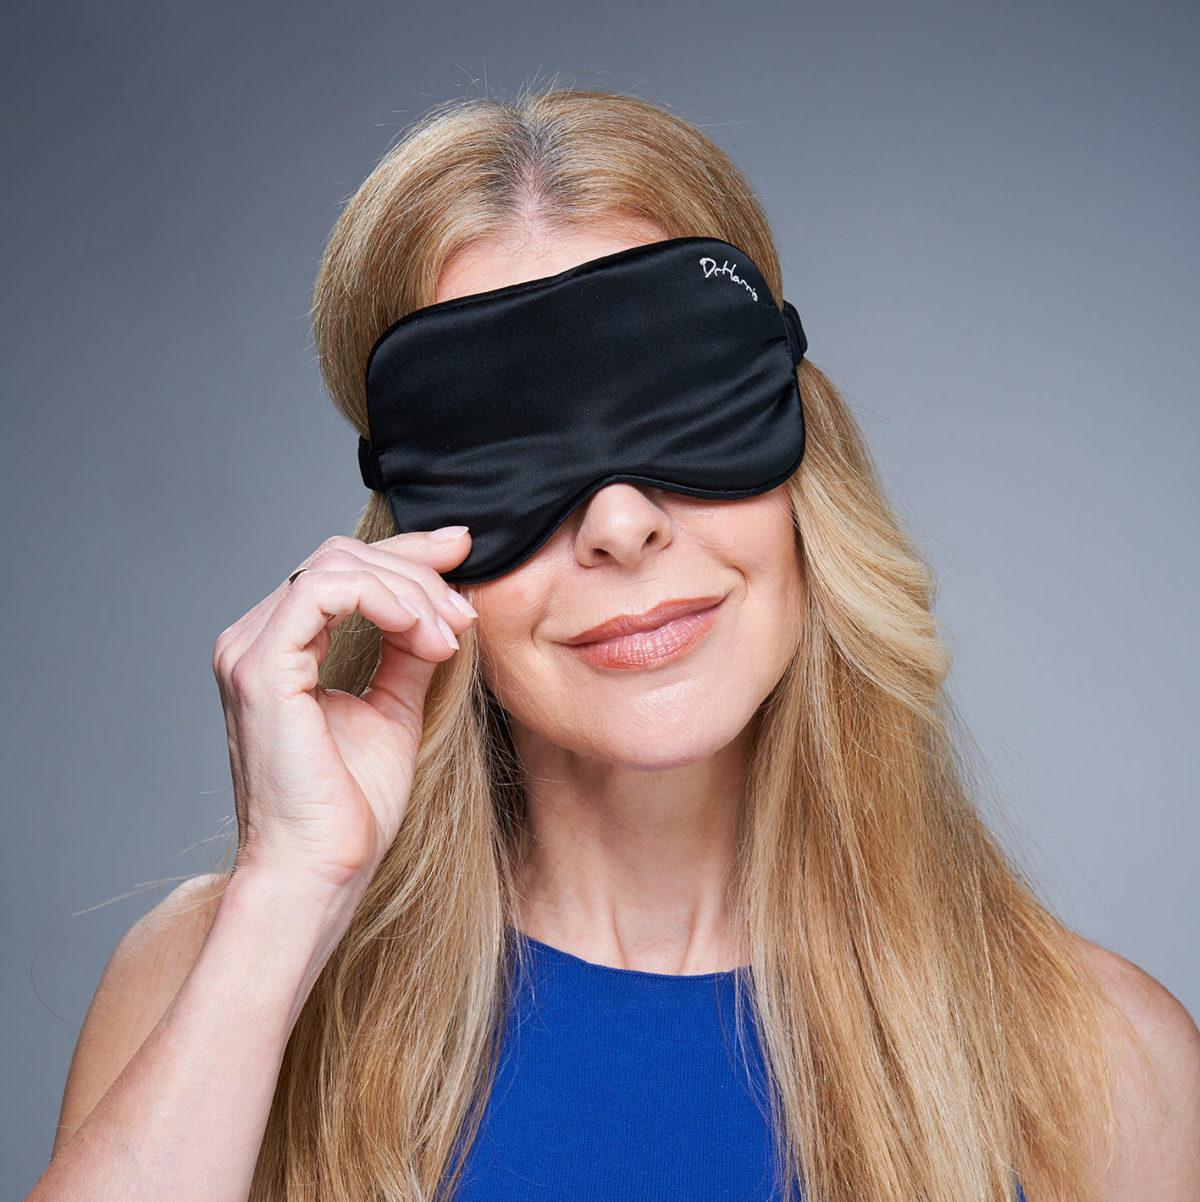 Introducing the Dr Harris Anti-Wrinkle Sleep Mask